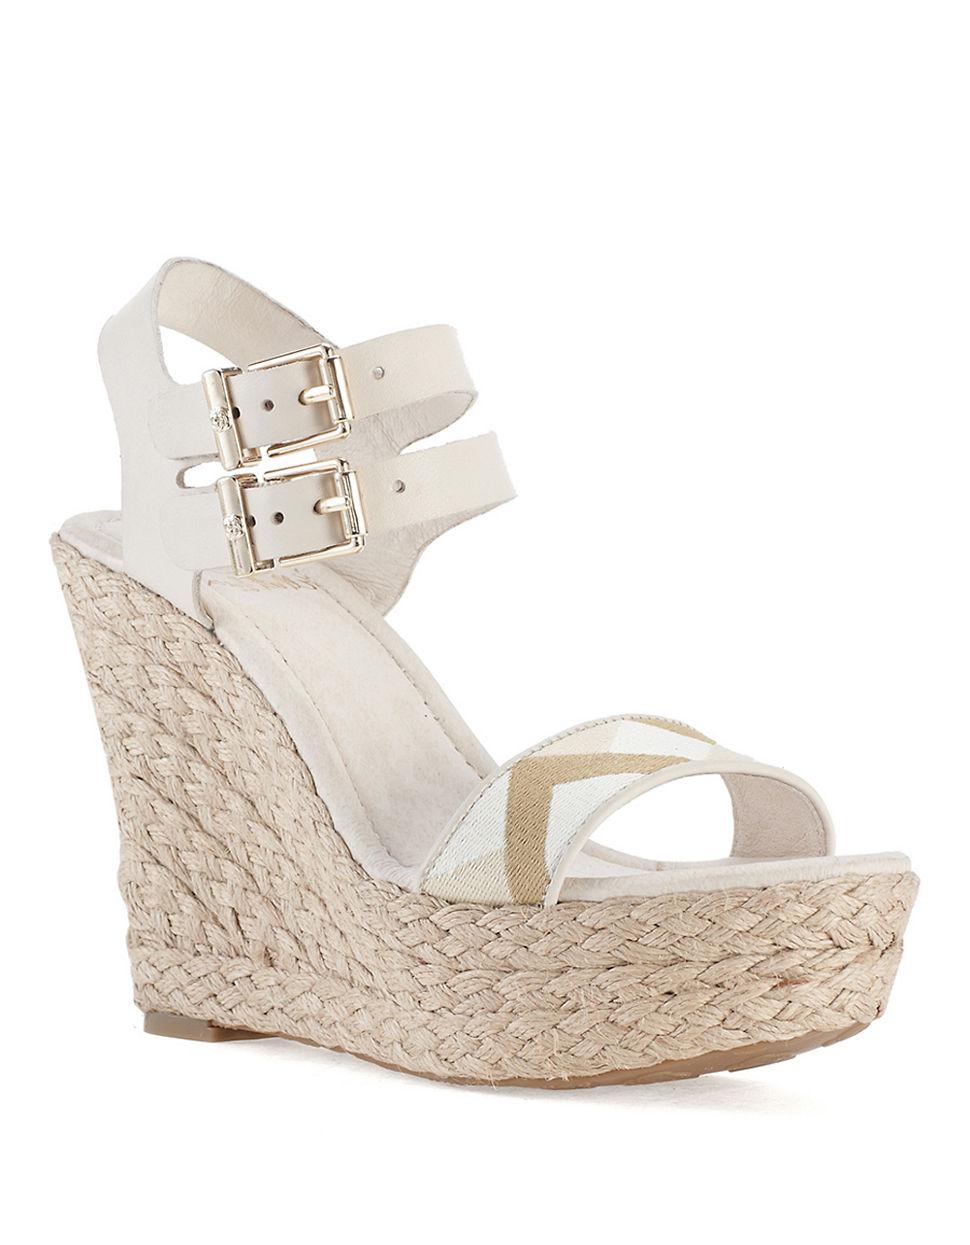 elliott lucca giulia platform wedge sandals in white lyst